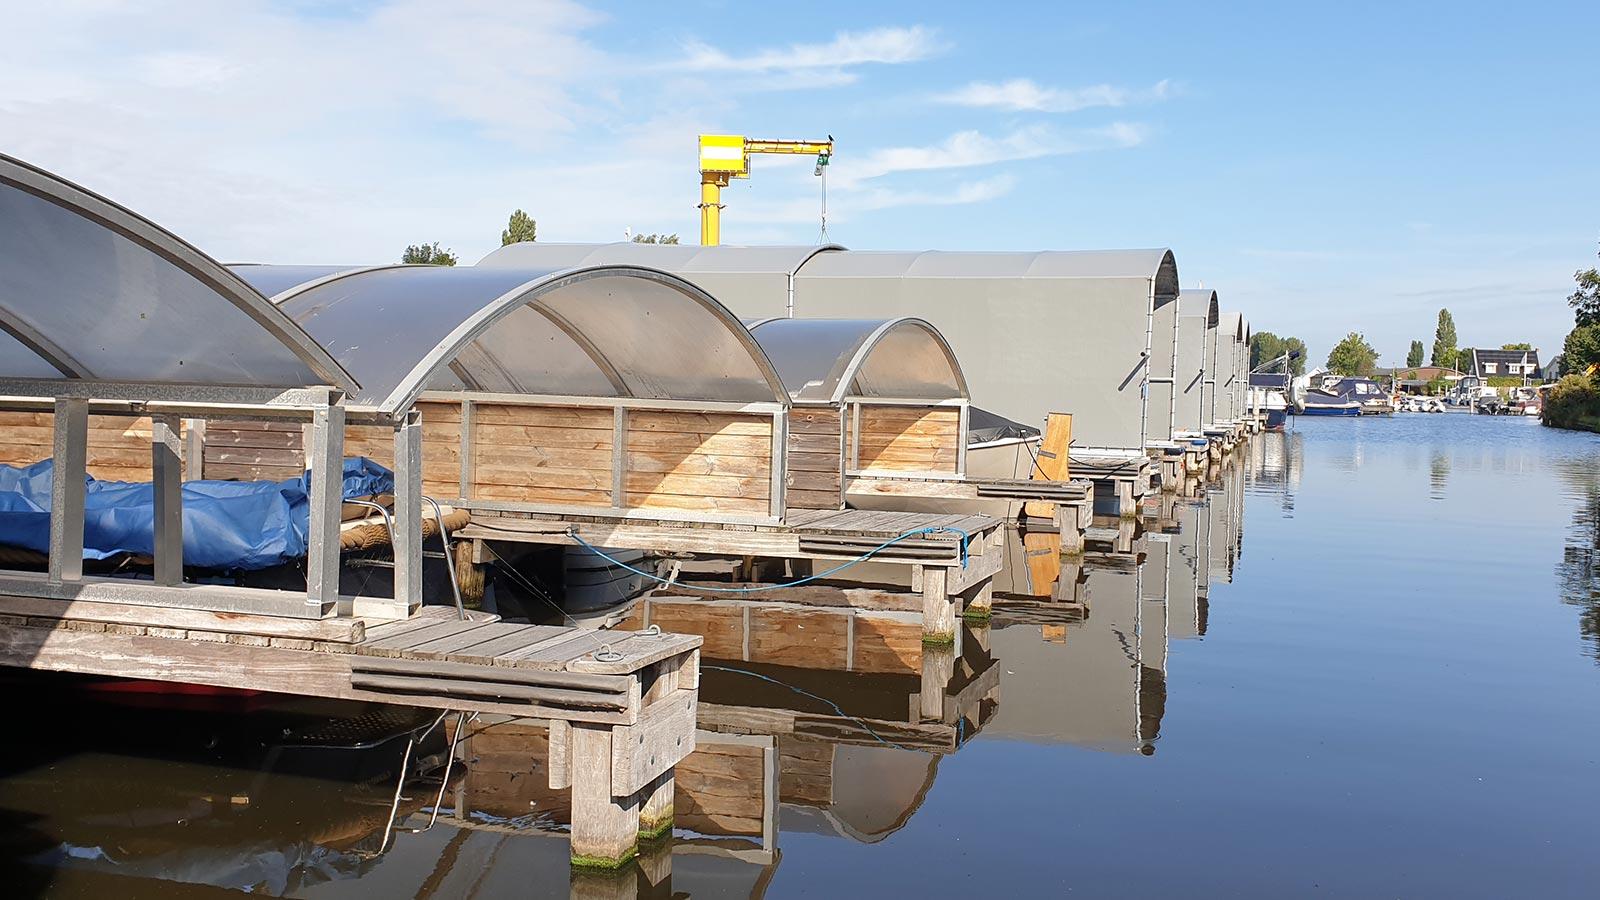 Jachthaven Otto - Overdekte botenhuizen